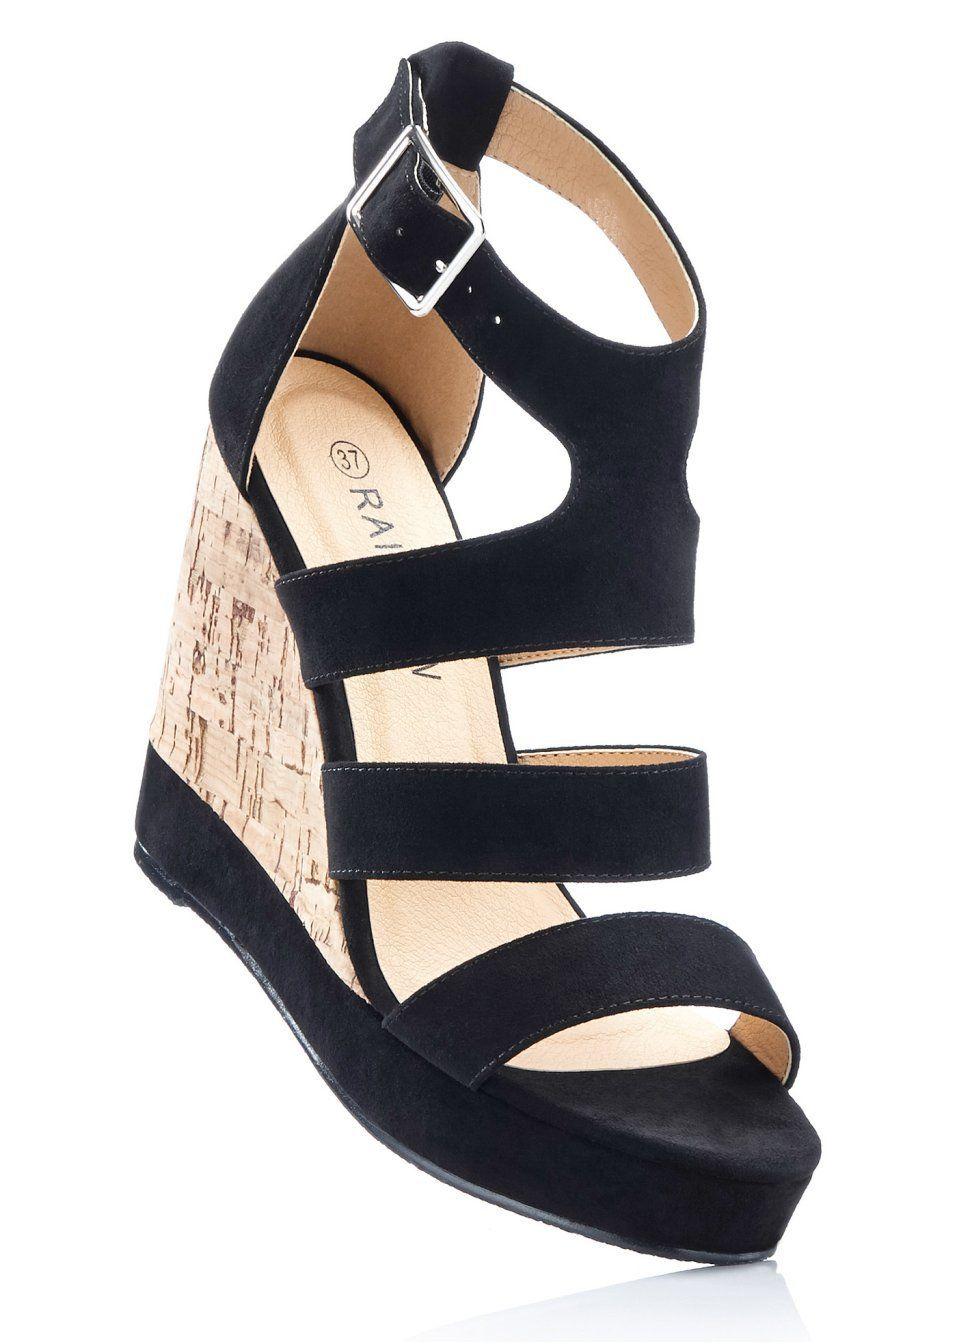 Sandaly Shoes Wedges Fashion